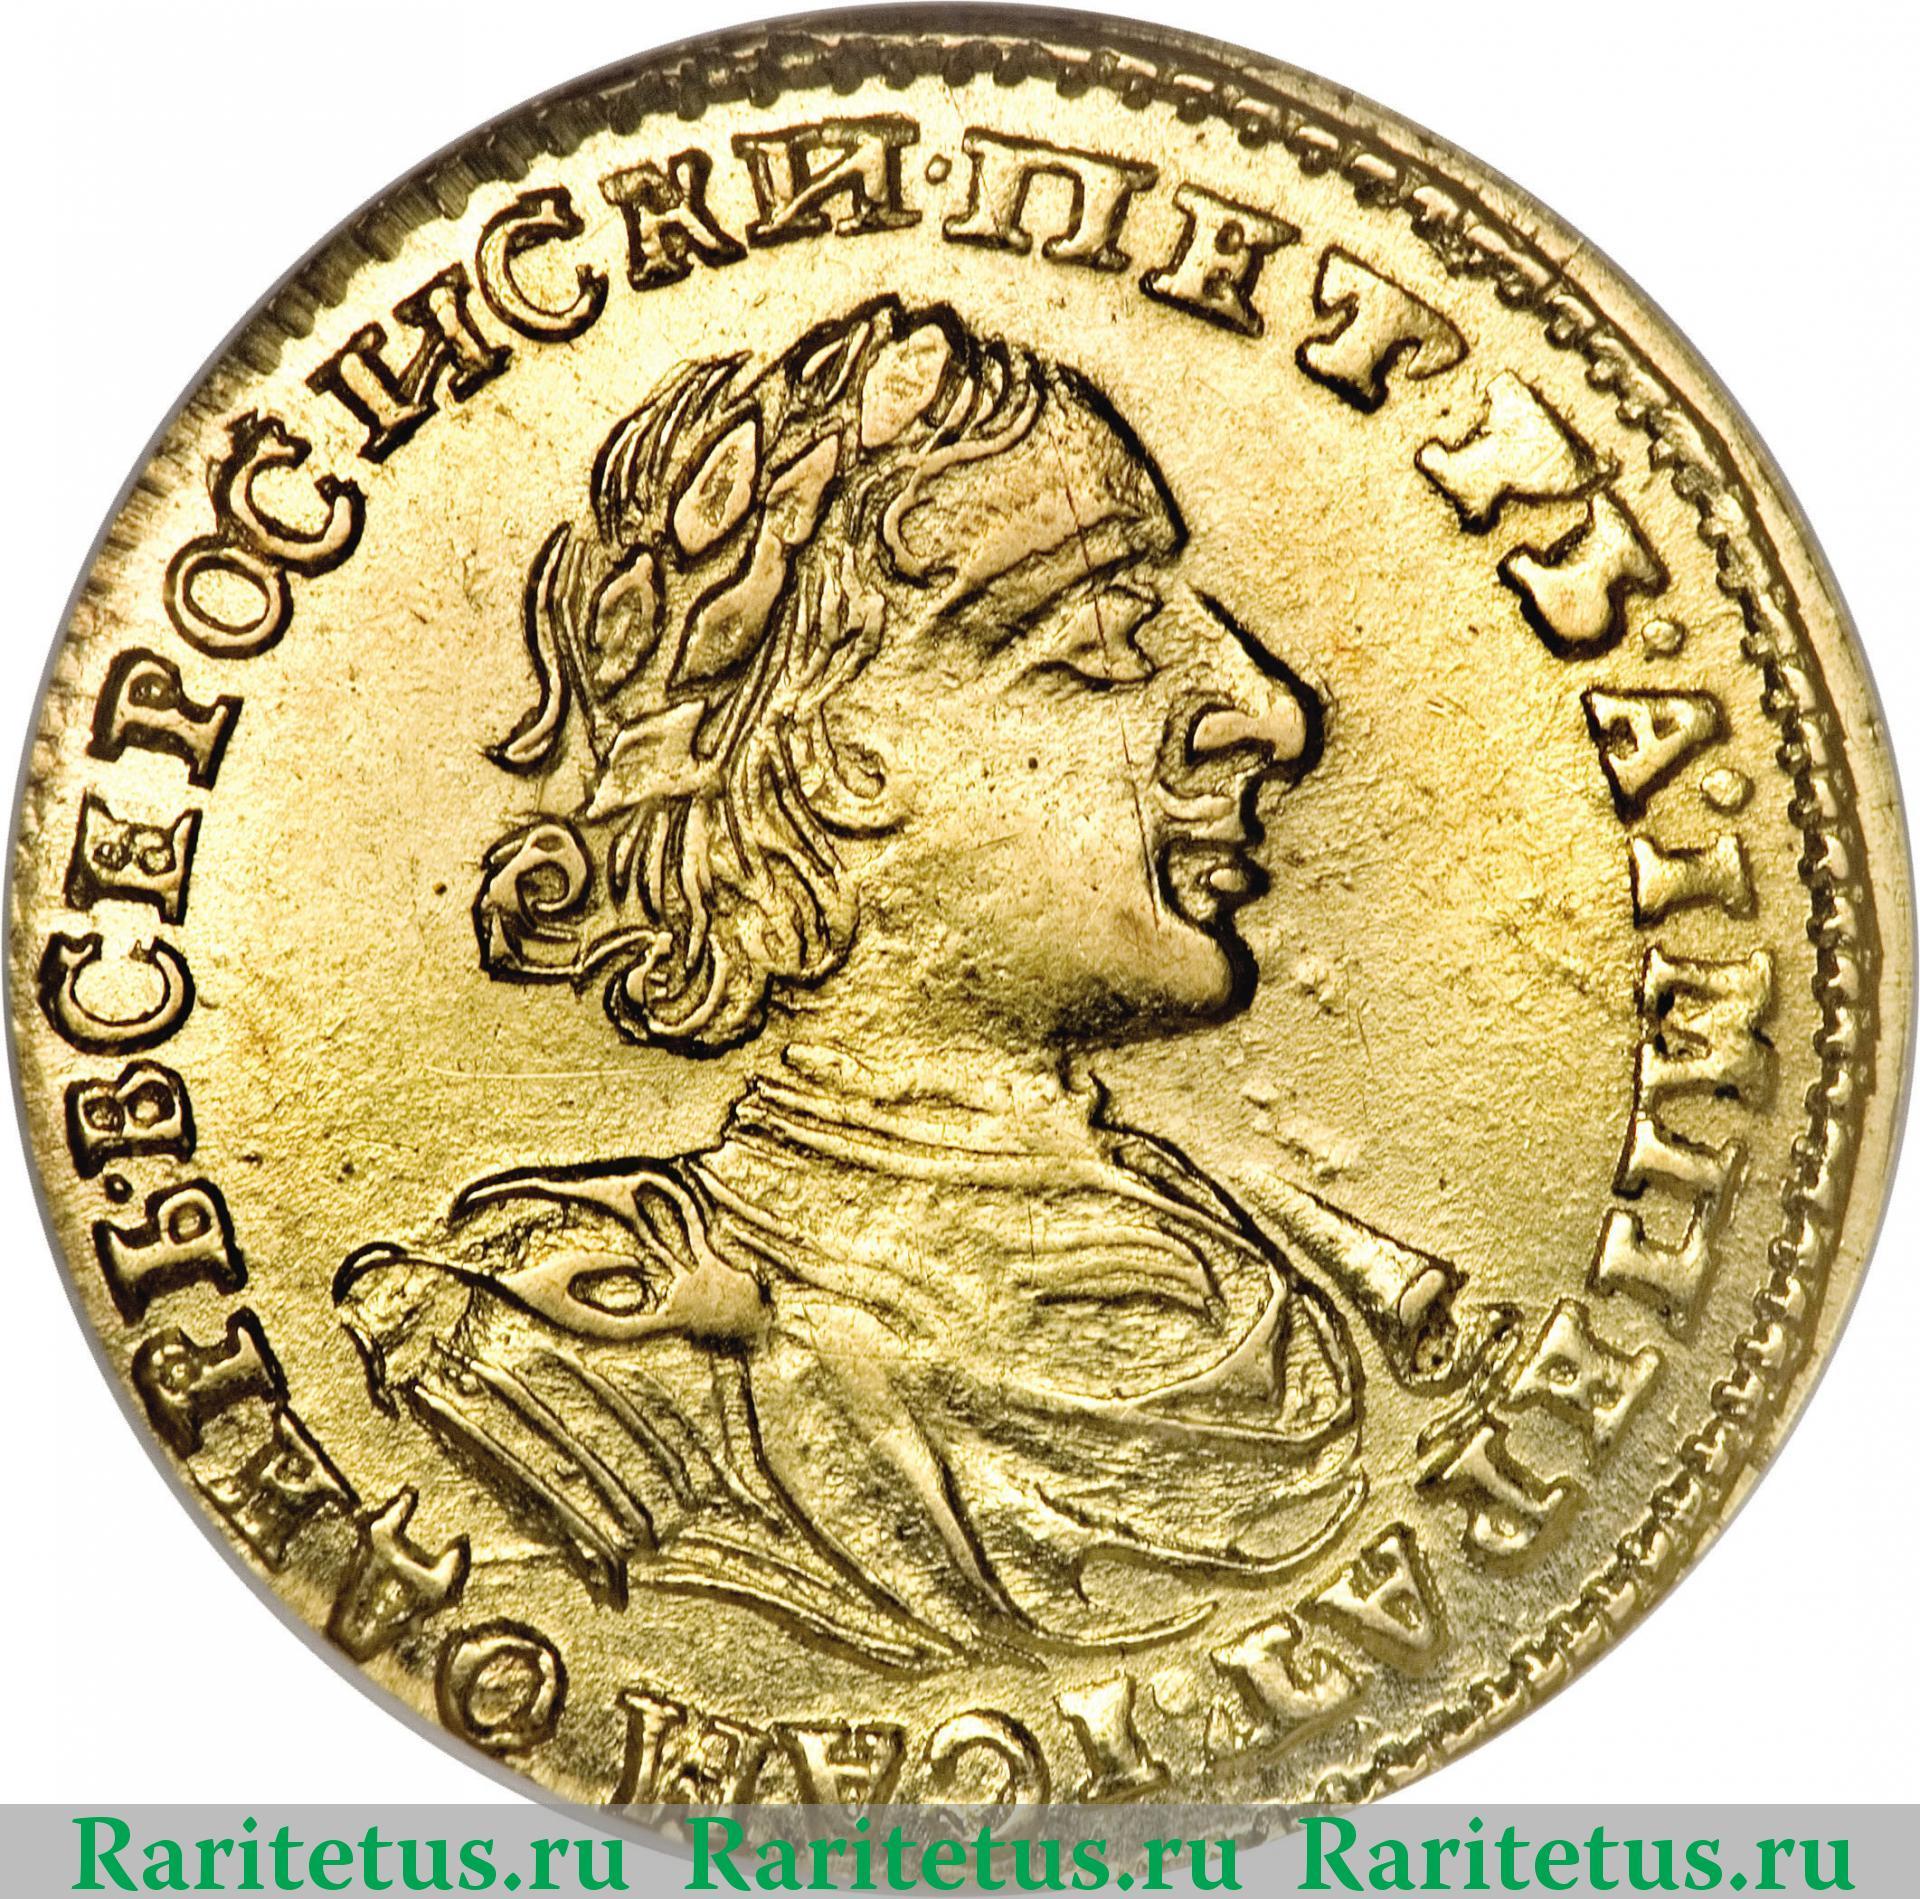 Царская монета 2 рубля 1722 как купить монетарное золото